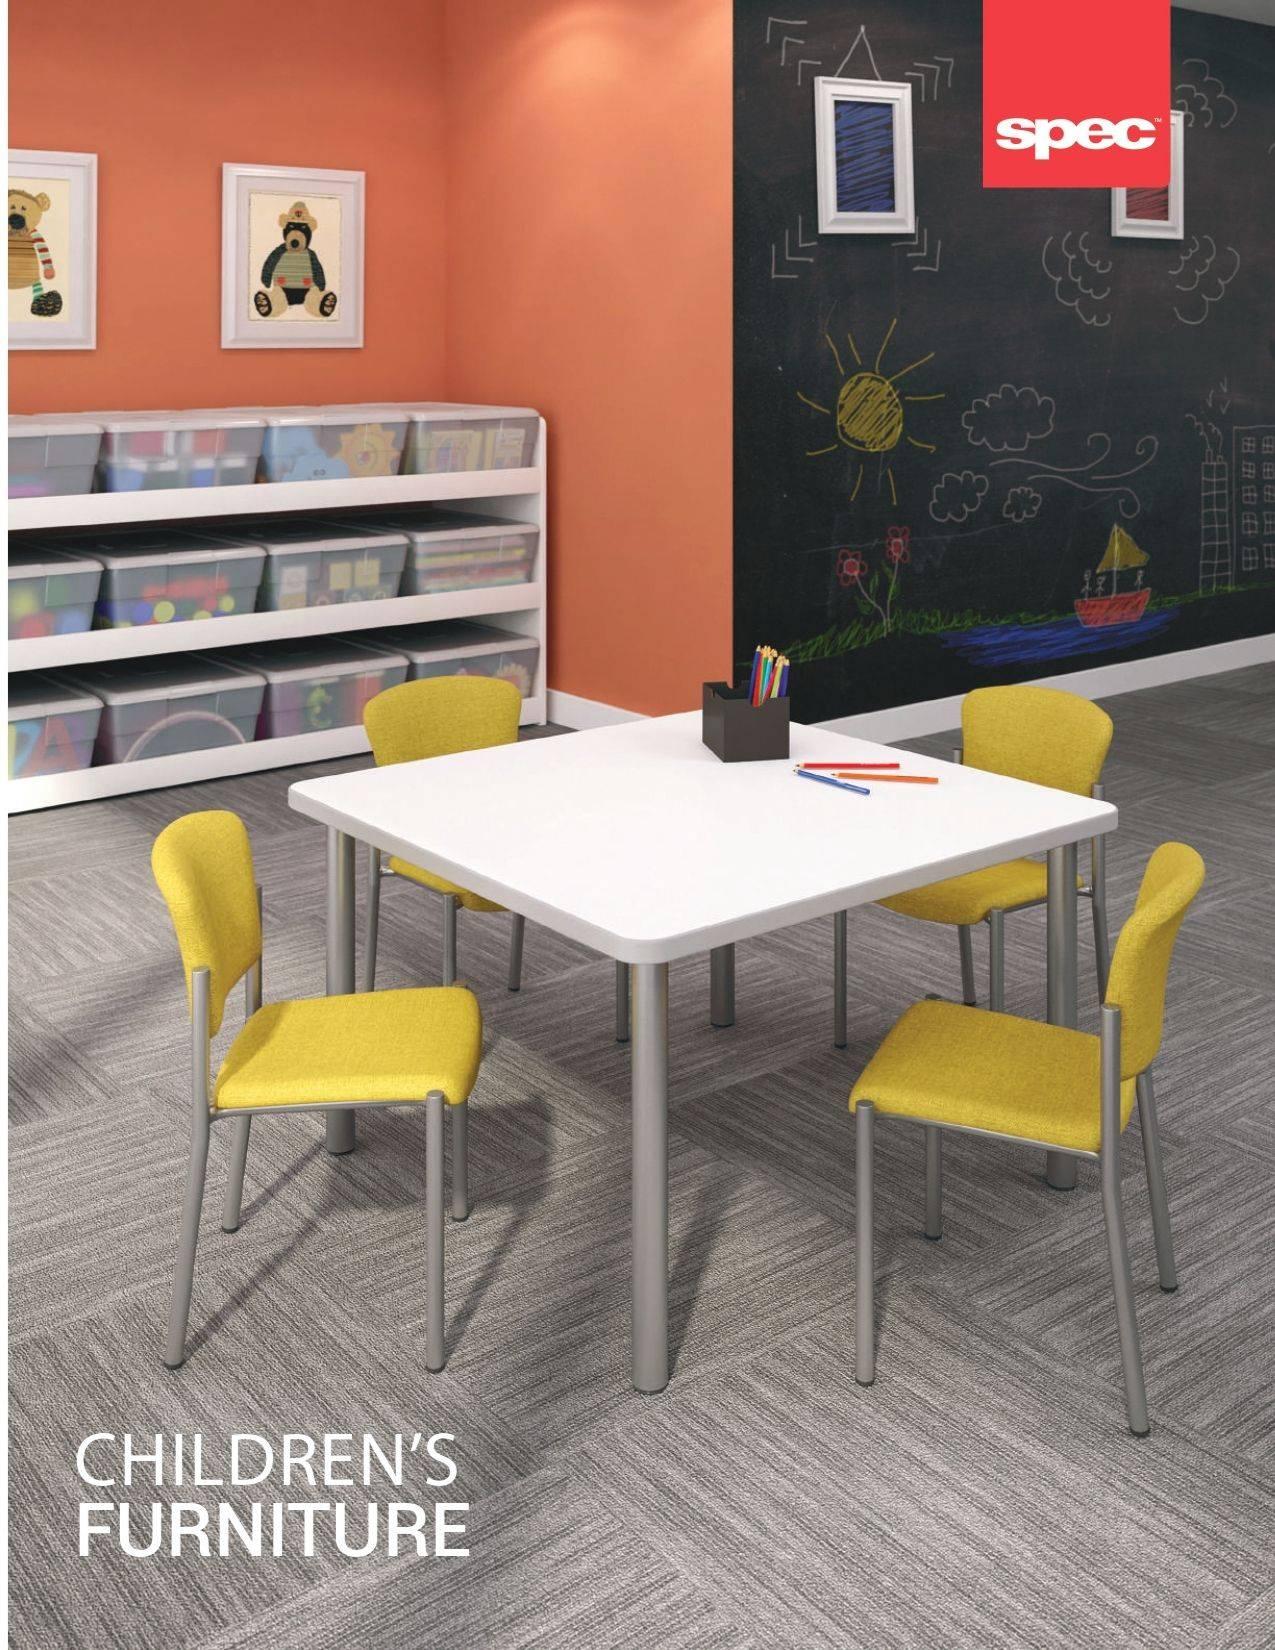 Spec Furniture Childrens Tables Brochure